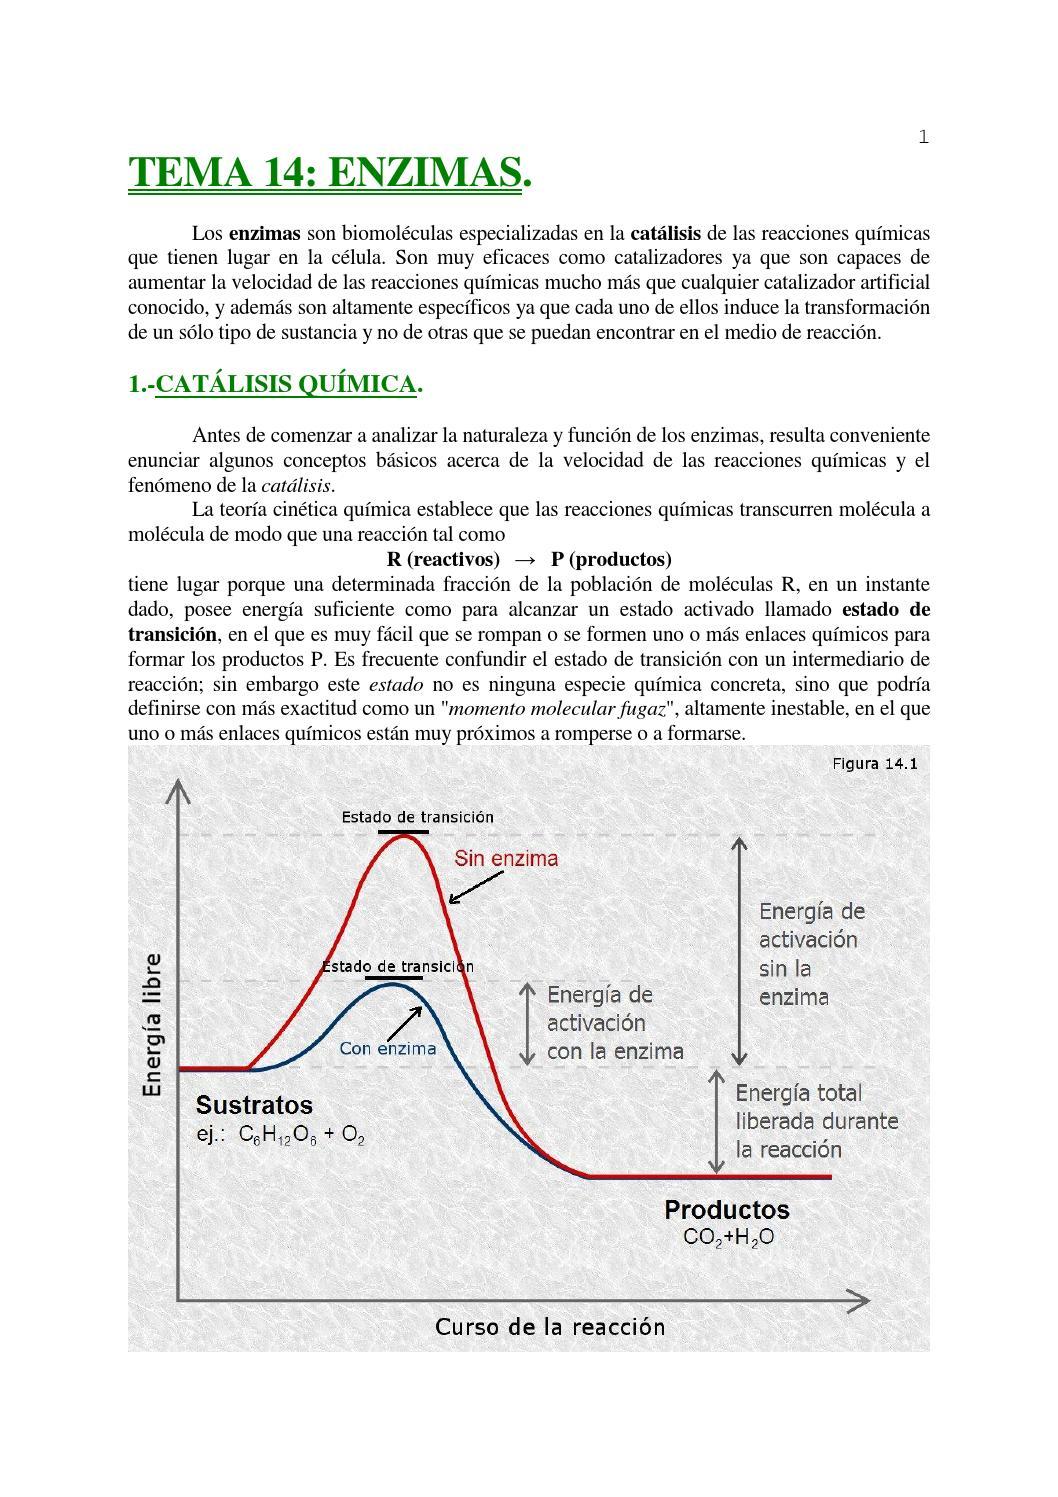 Enzimas repartido by clasesparticulares en montevideo issuu for Que significa molecula